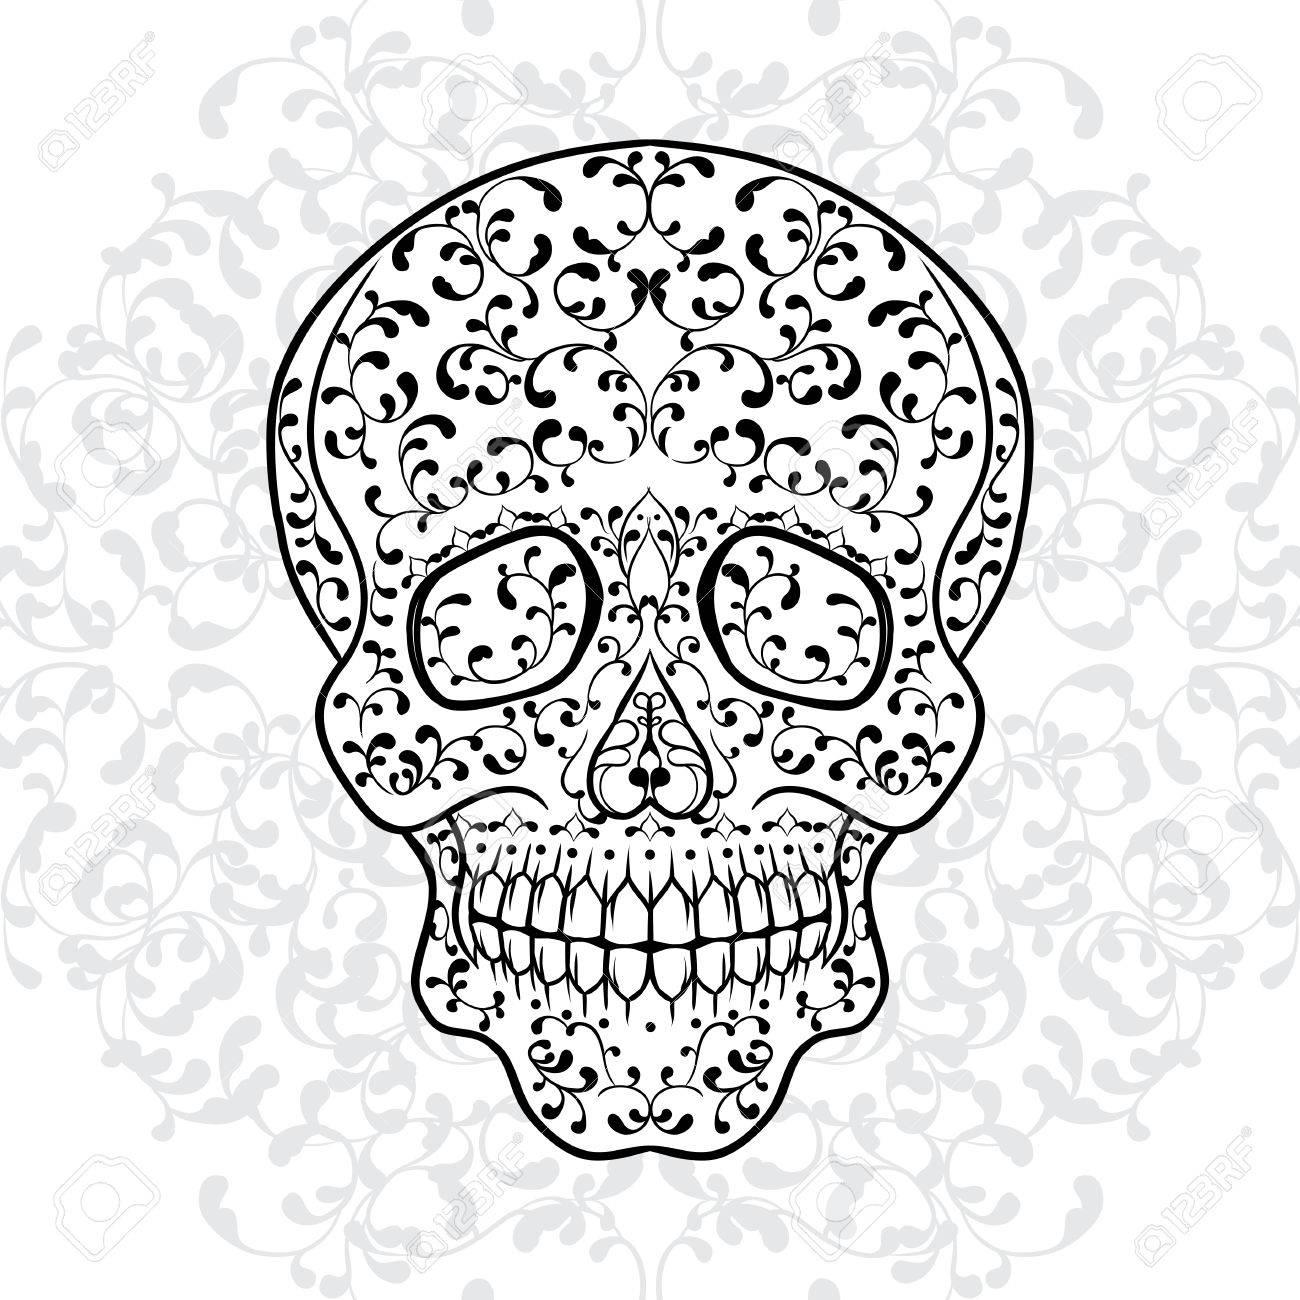 hand drawn sugar skull dia de los muertos vector illustration